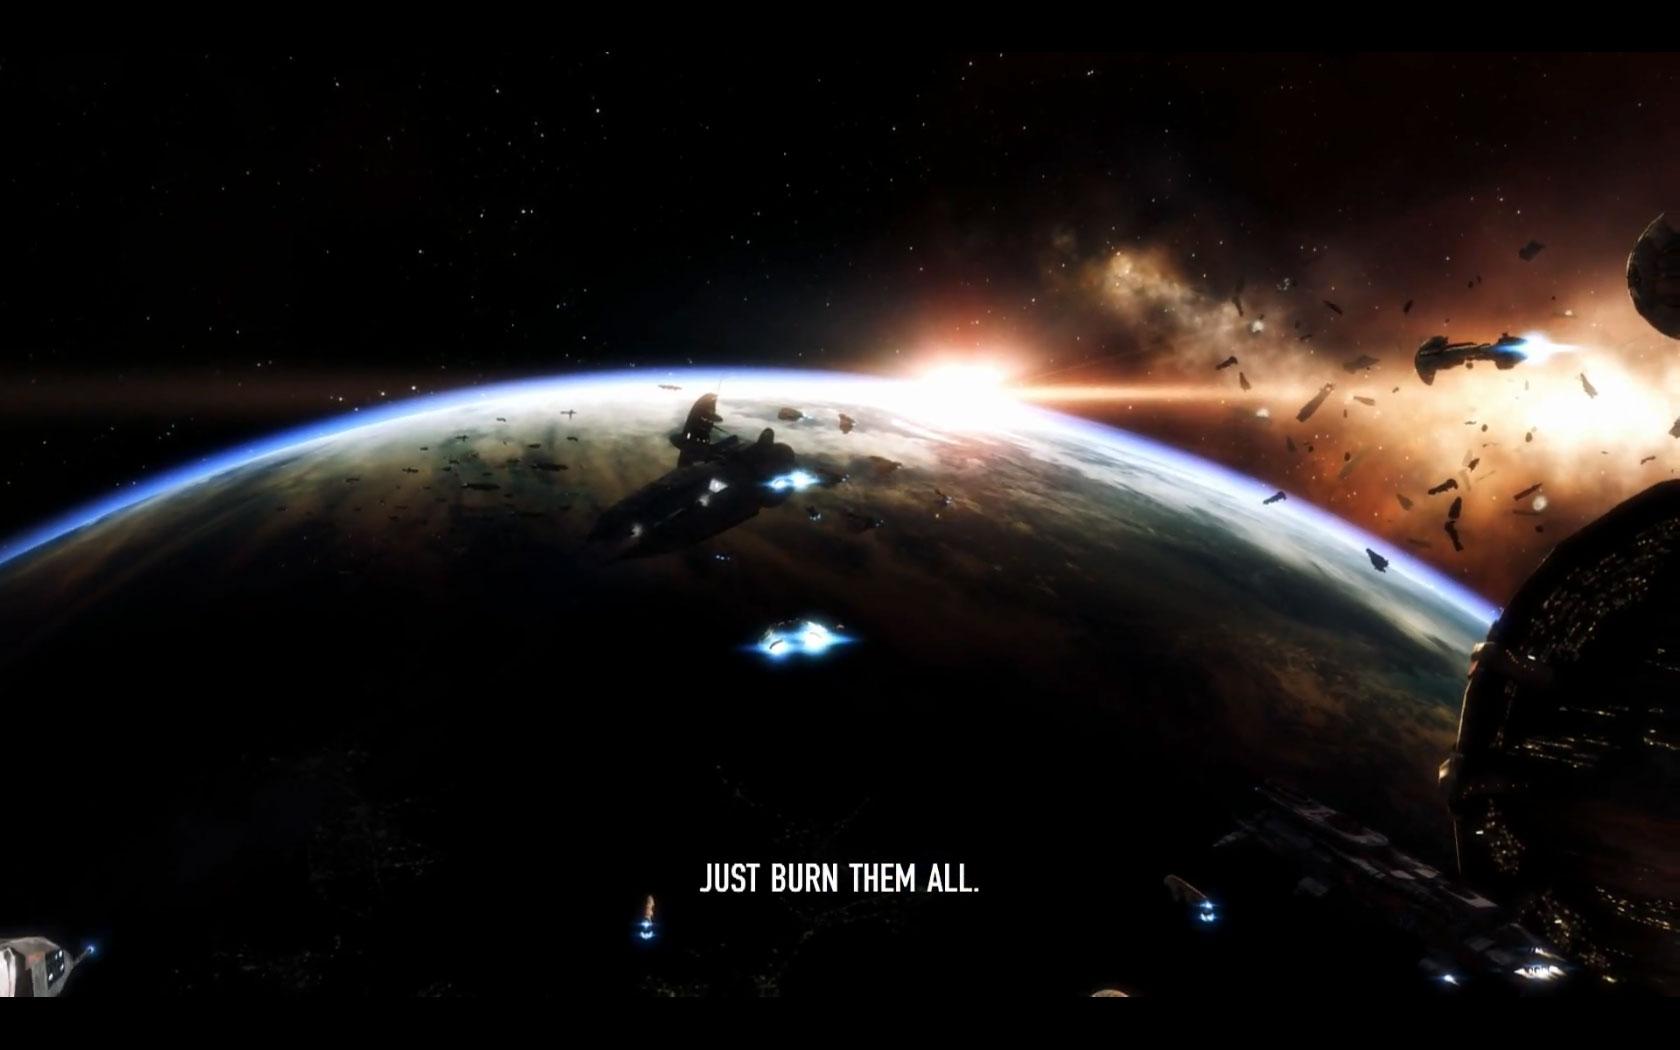 f13 net forums - Internet Spaceship Jihad Online - Join f13